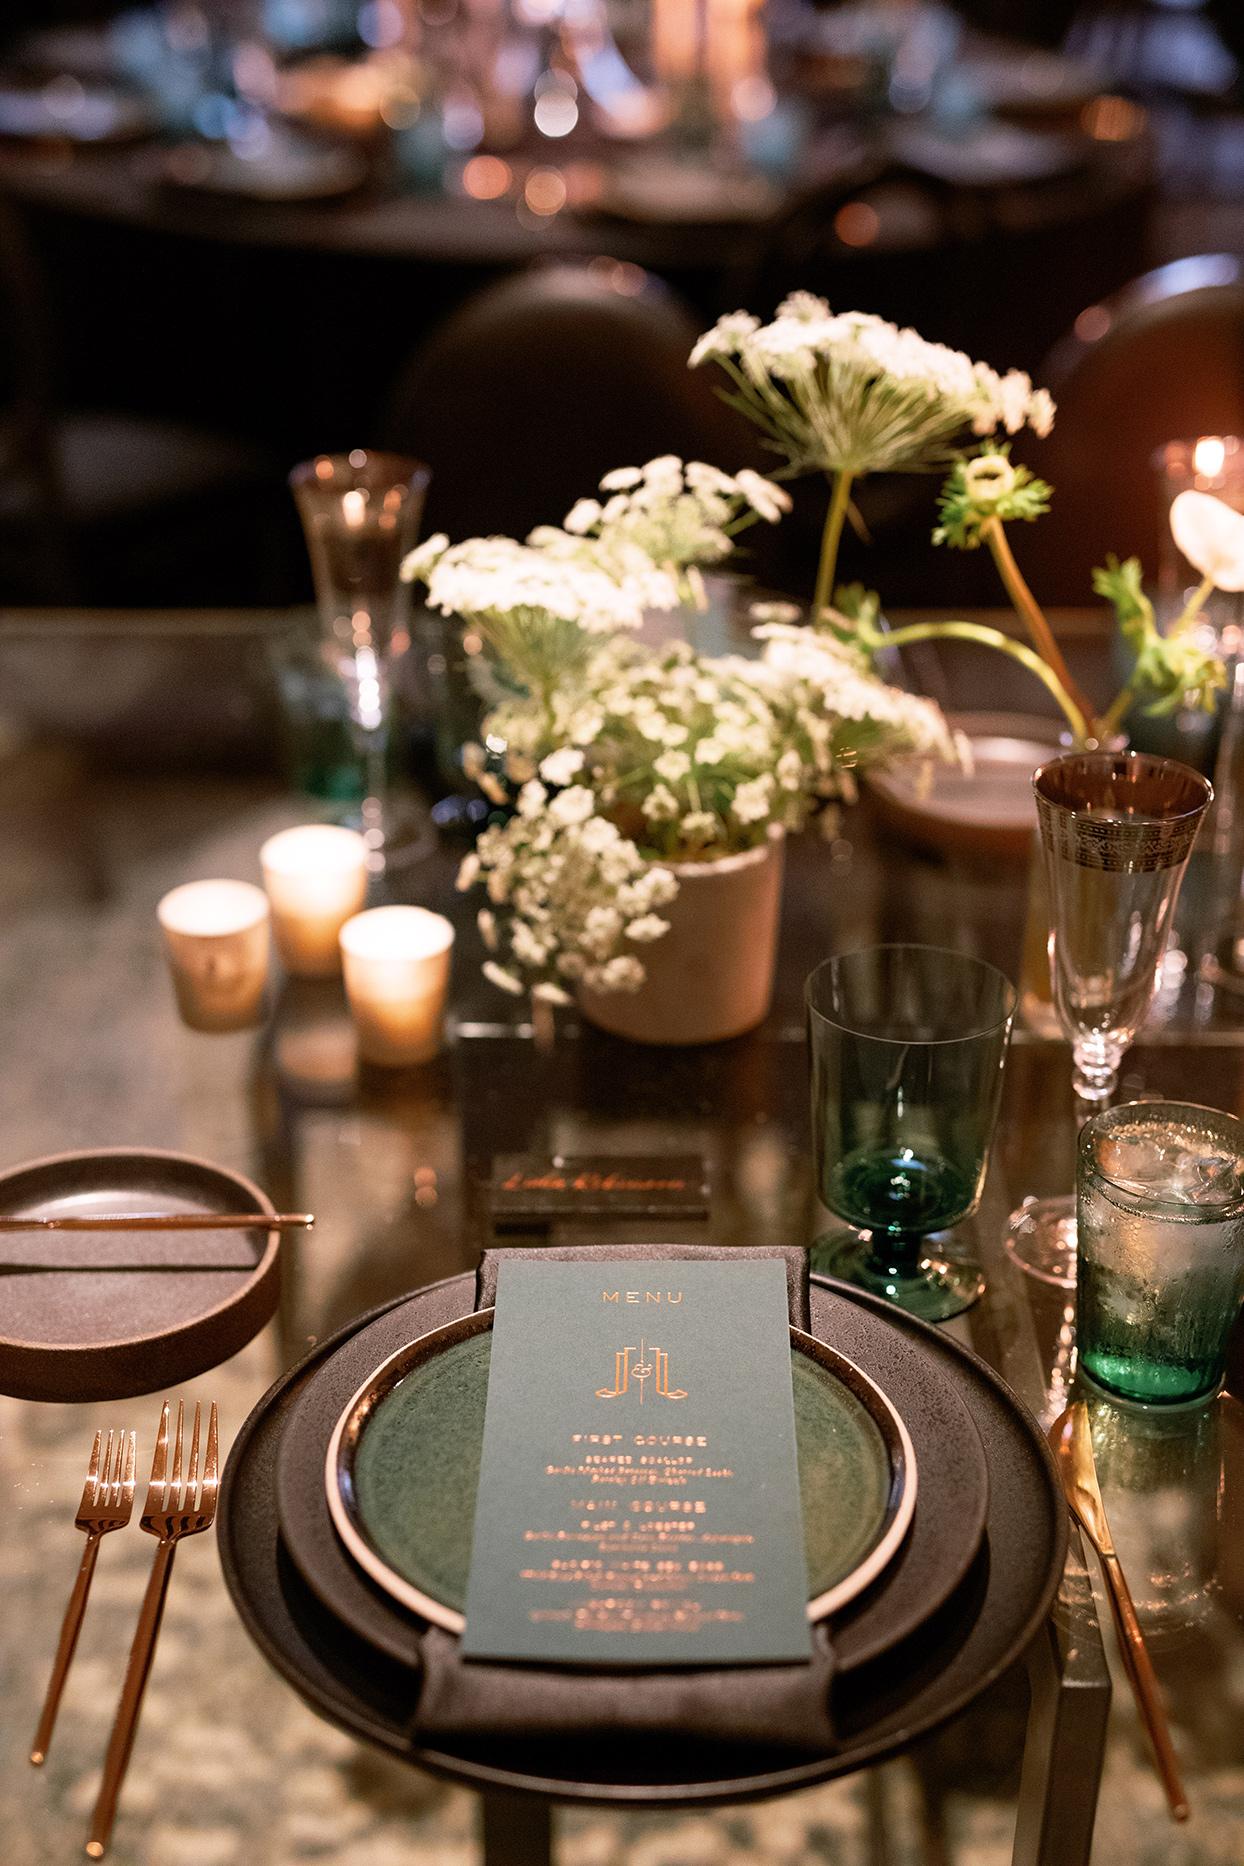 jason justin wedding reception dark tones place setting